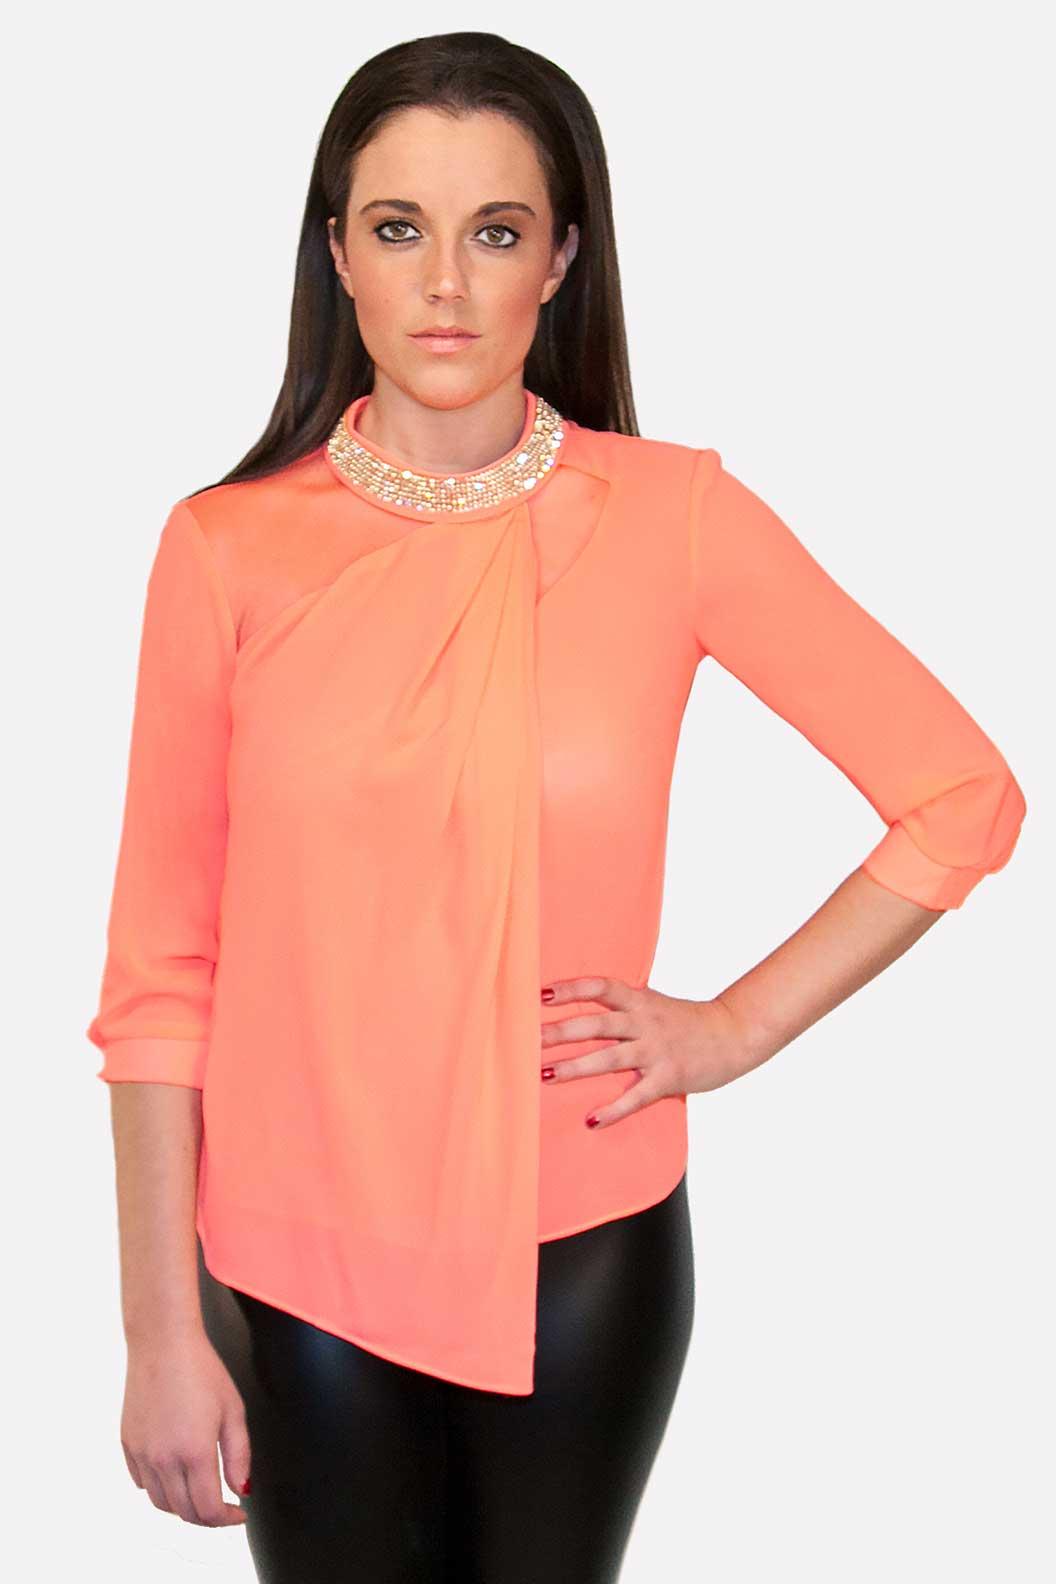 Coral Rhinestone Blouse Purely Elegant